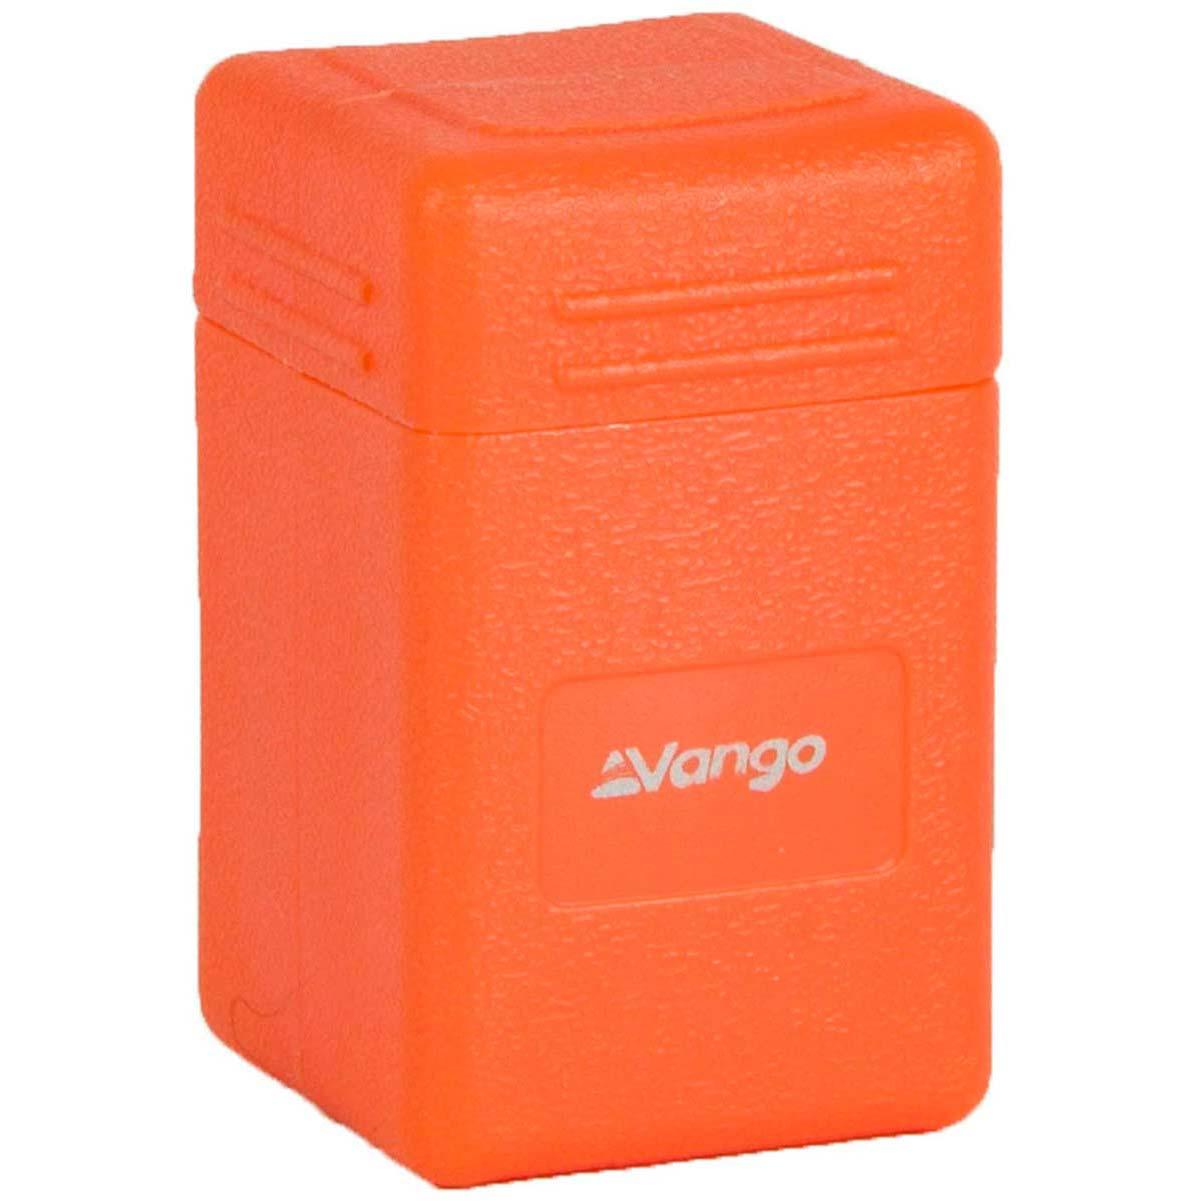 Vango Compact Stove